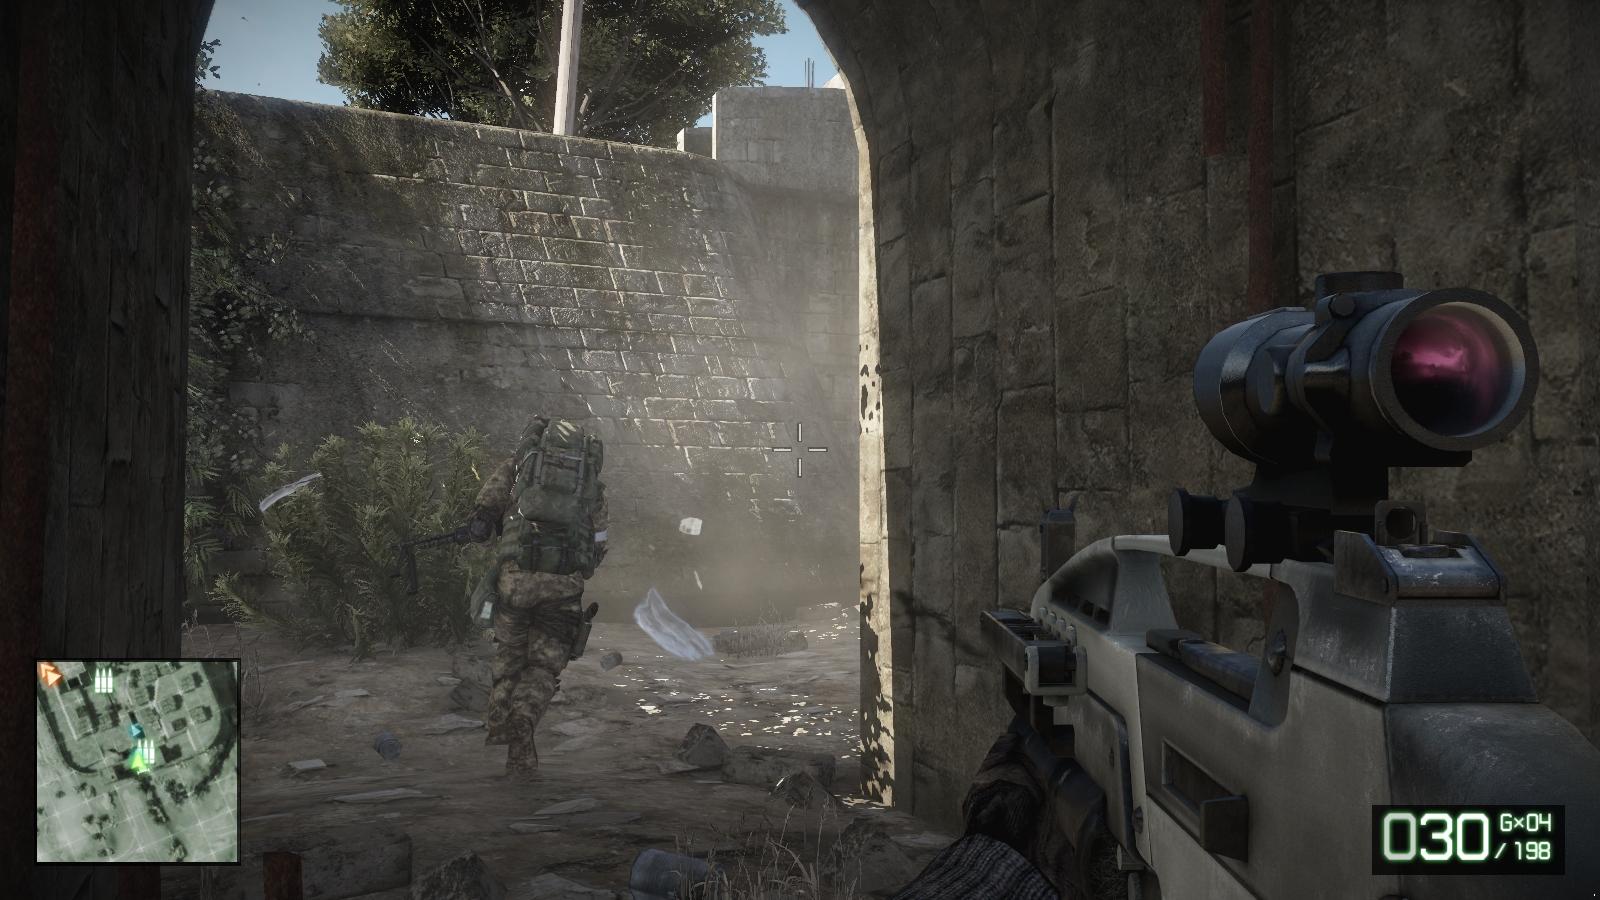 Shoot-Out – Battlefield: Bad Company 2 vs Call of Duty: Modern Warfare 2